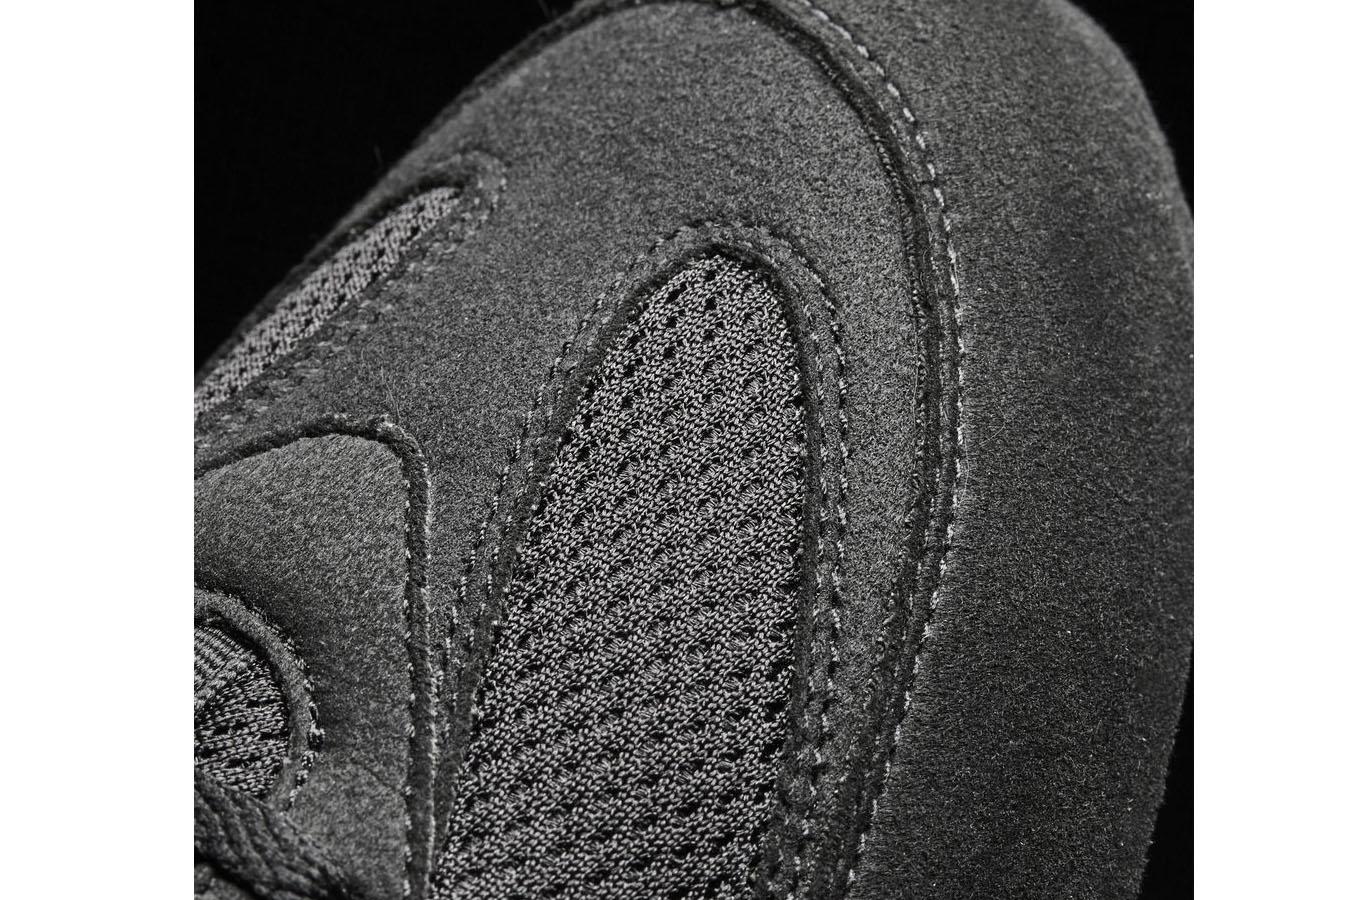 official photos 7ed8c 55ebe Hog Chaussures Boxe G97067 Box Adidas Anglaise rggYtH